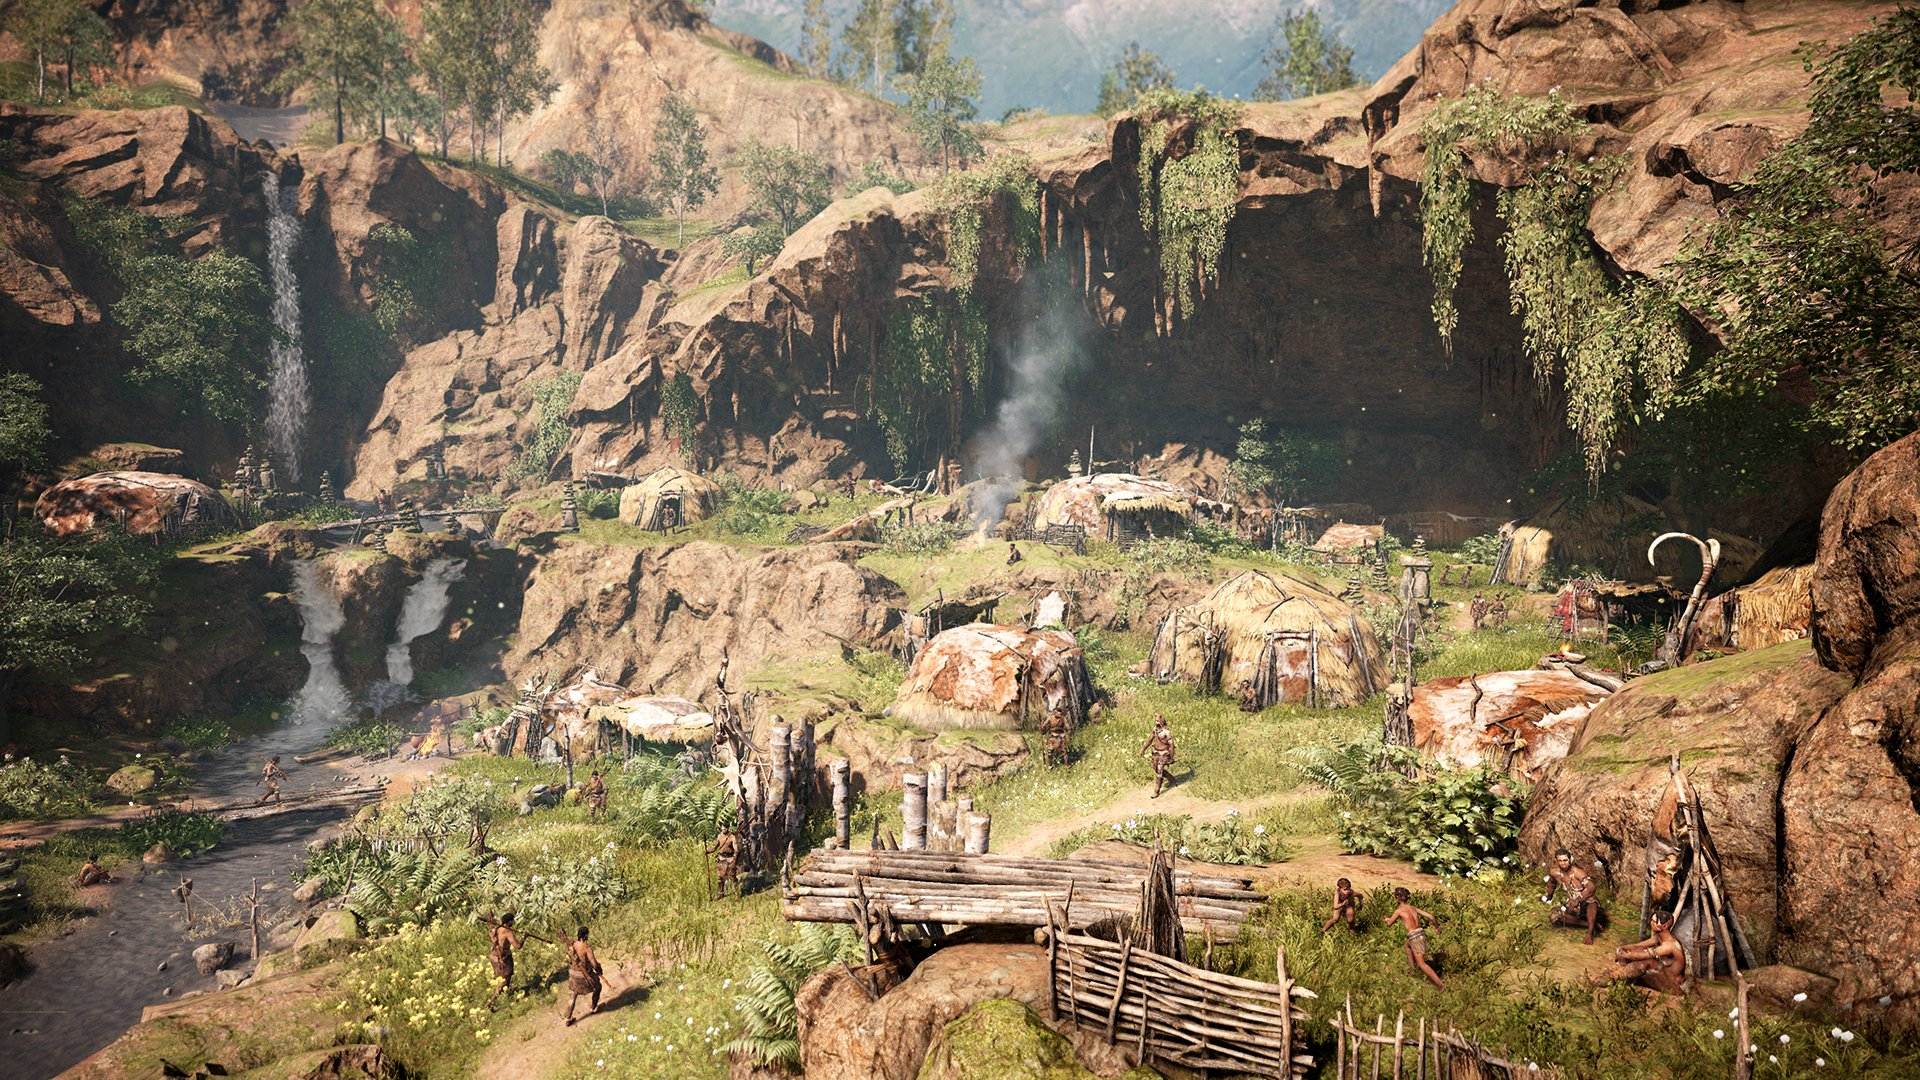 Wenja village